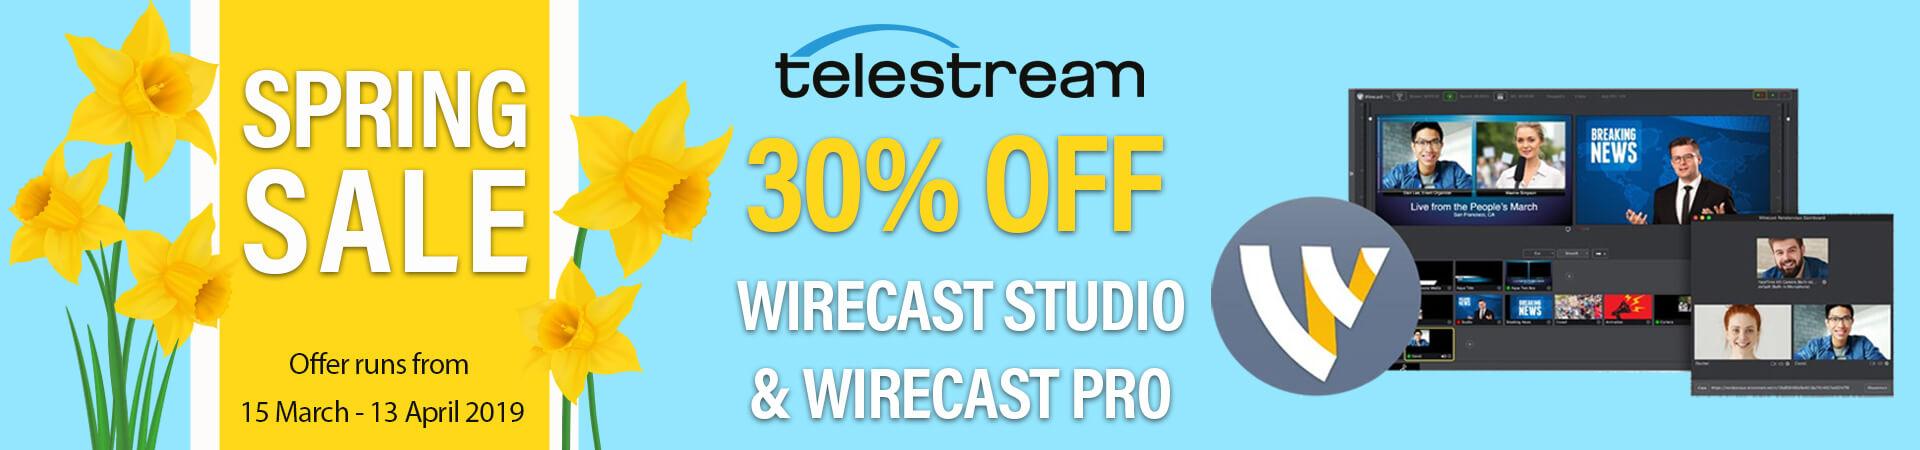 Telestream Wirecast Spring Sale